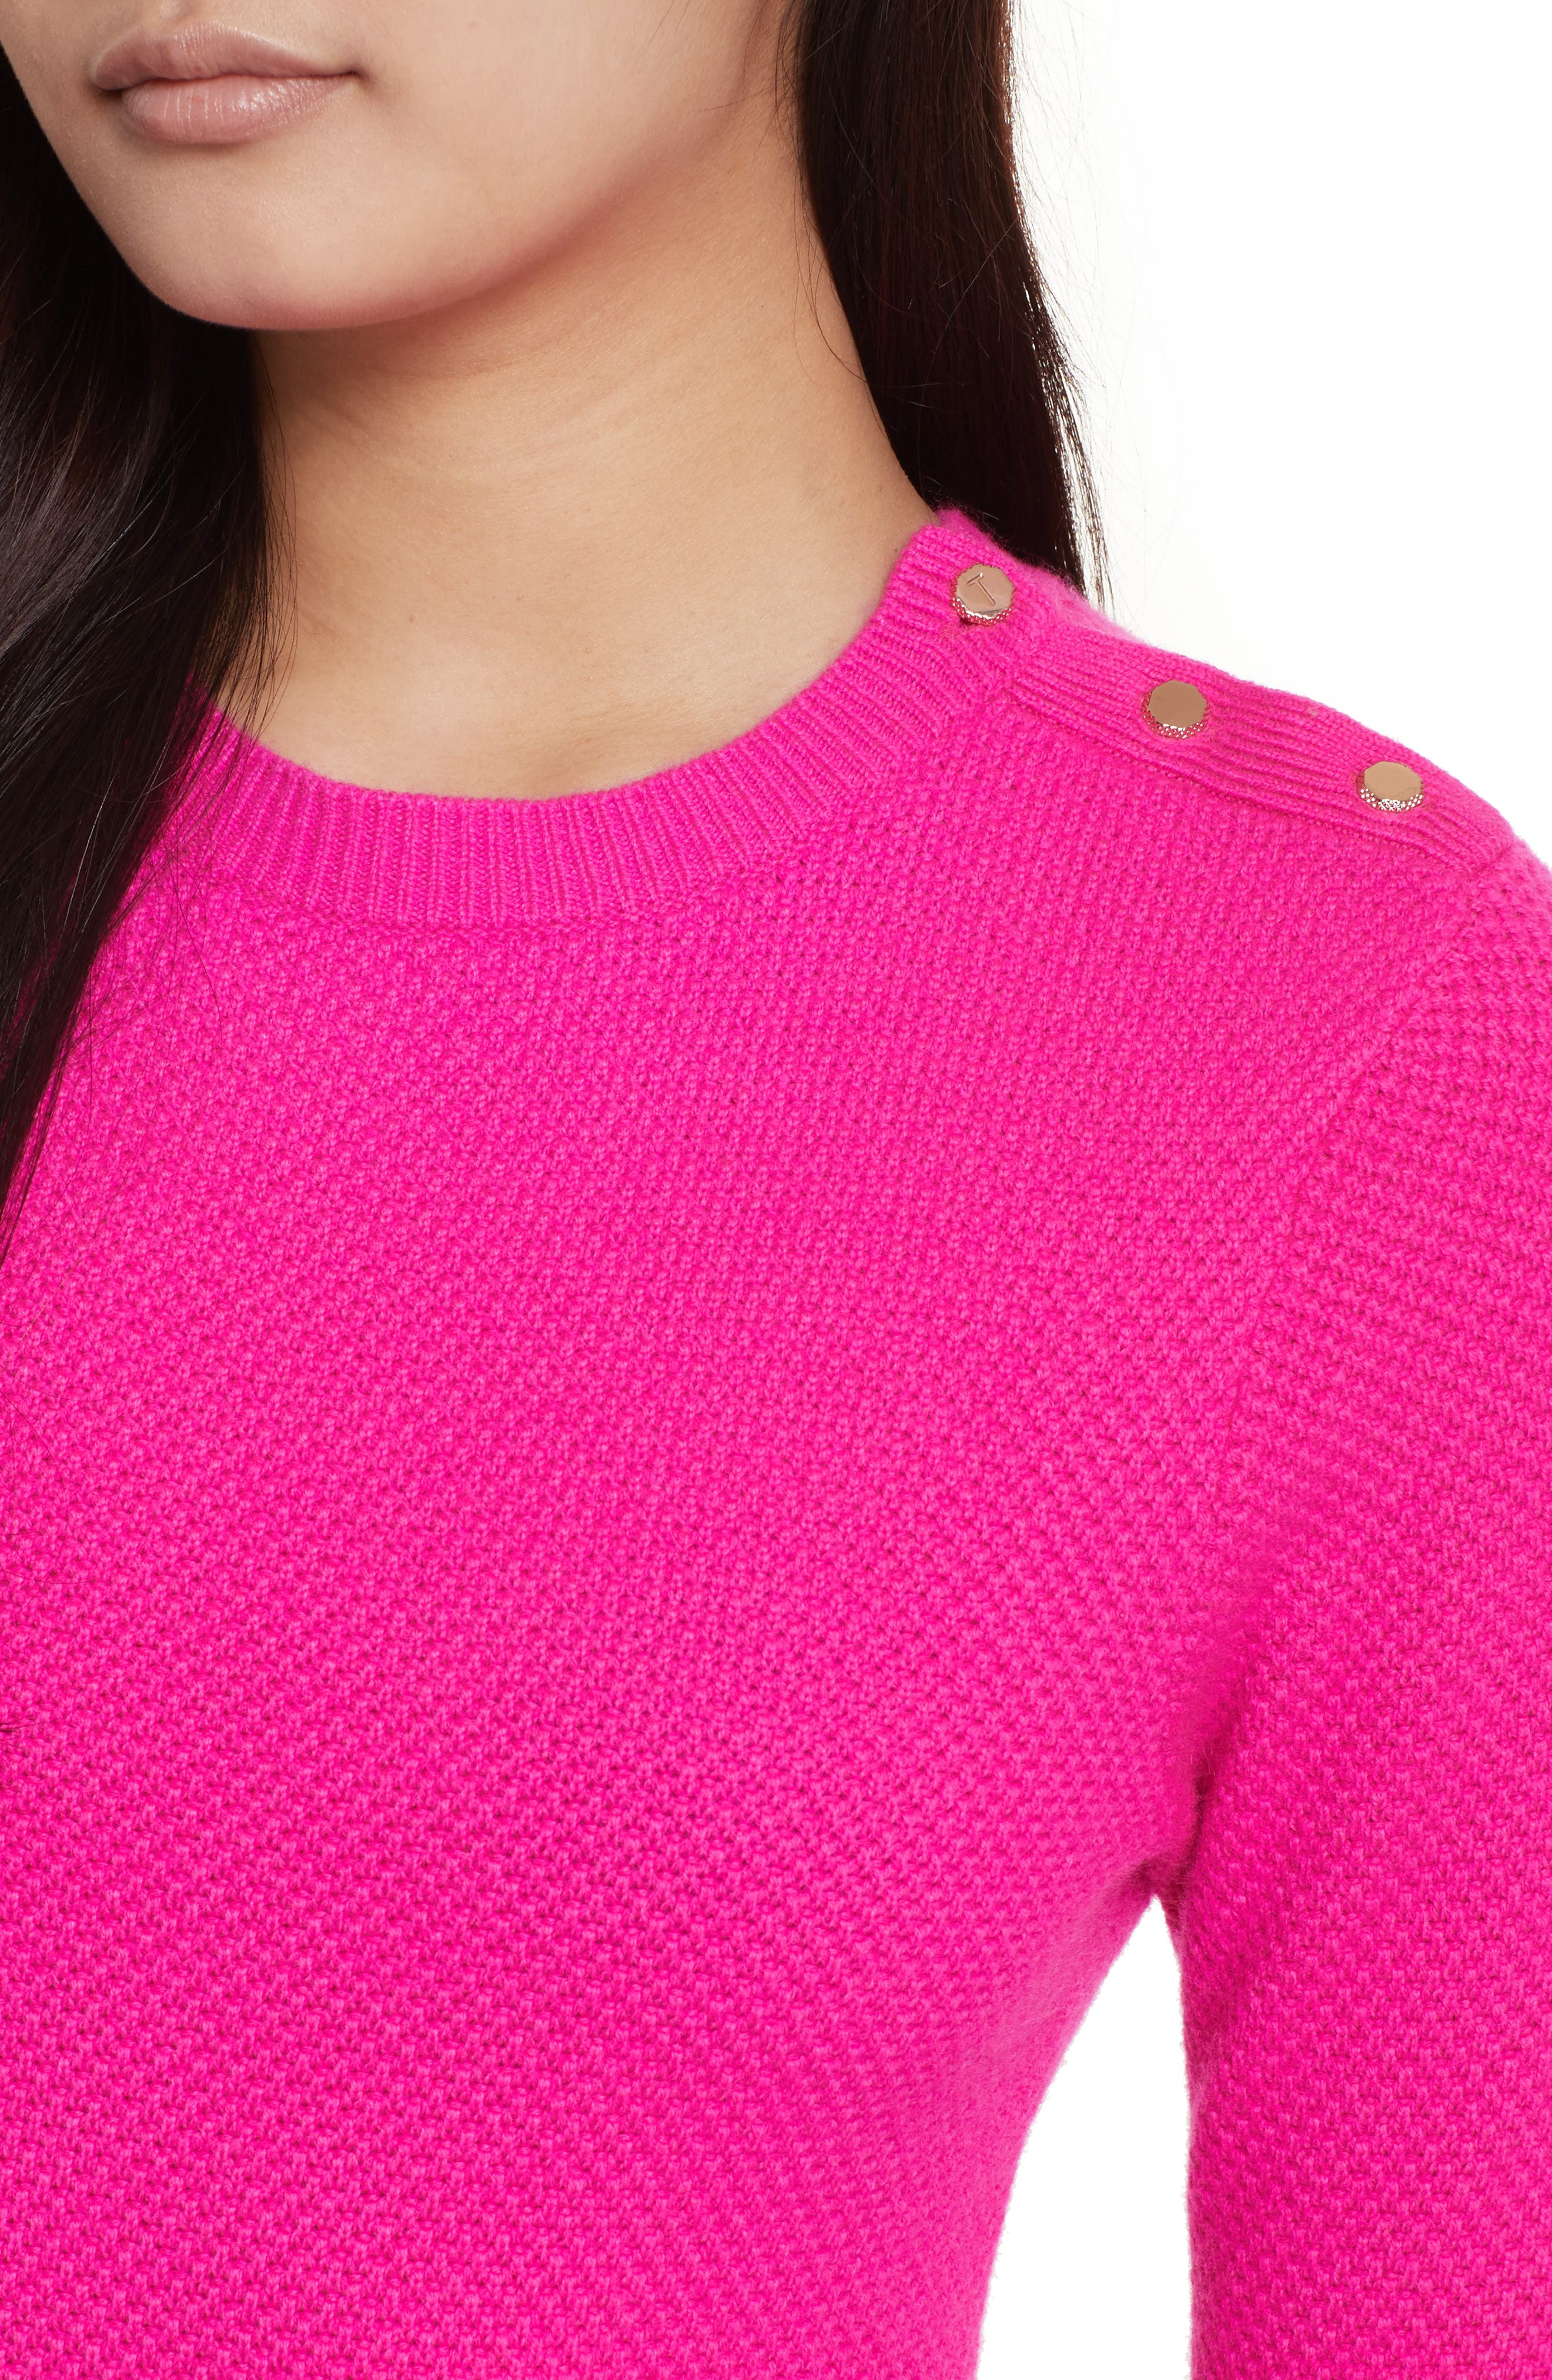 Textured Merino-Wool-Blend Sweater,                             Alternate thumbnail 4, color,                             670